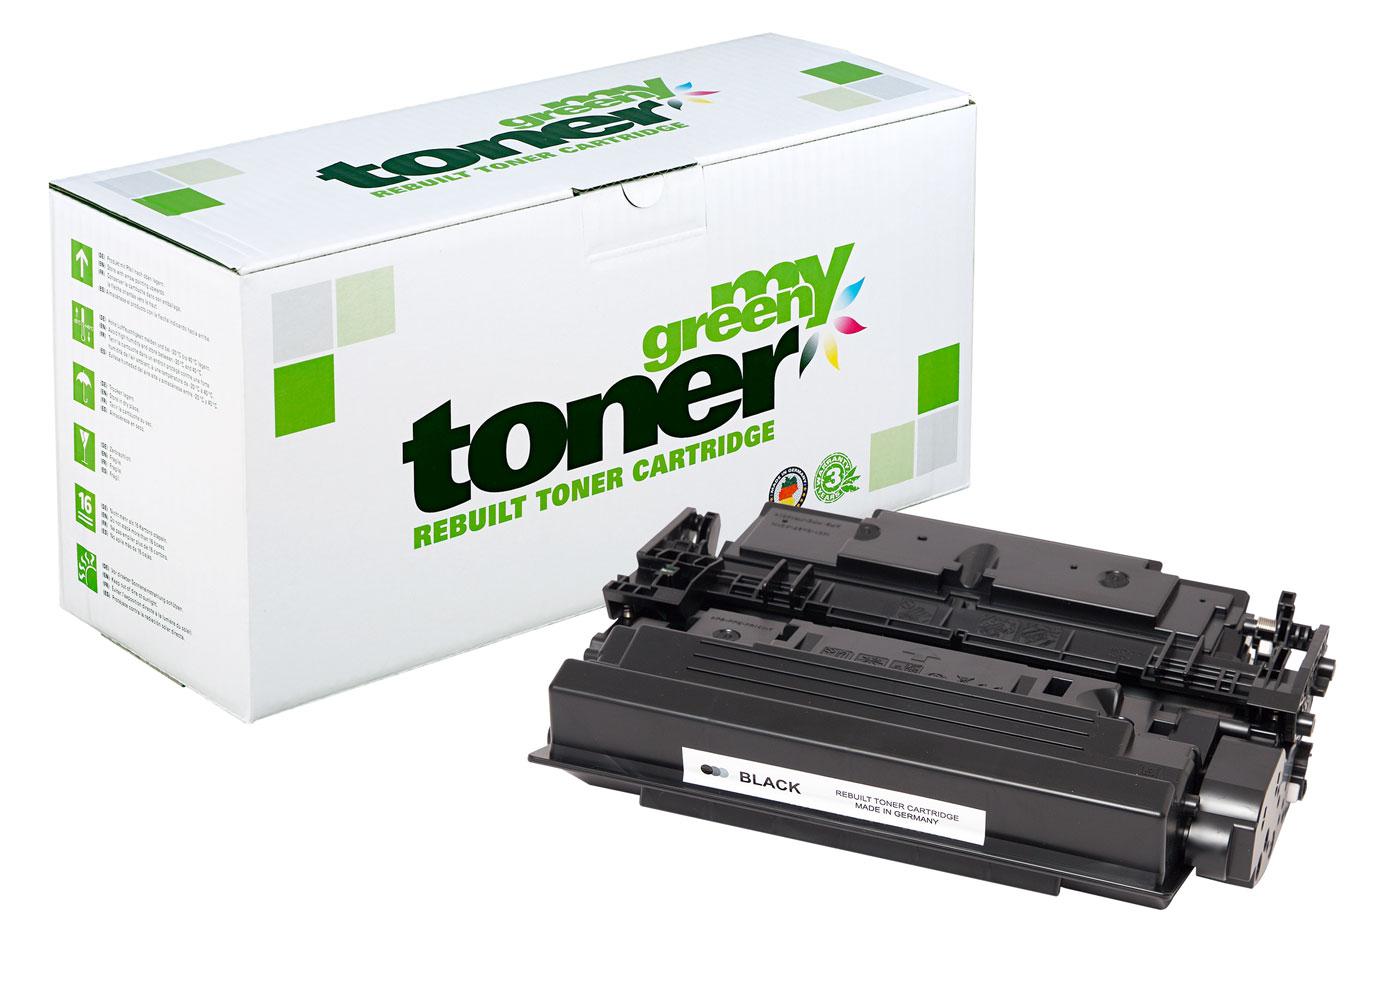 Rebuilt toner cartridge for HP LaserJet Enterprise M507 a. o.